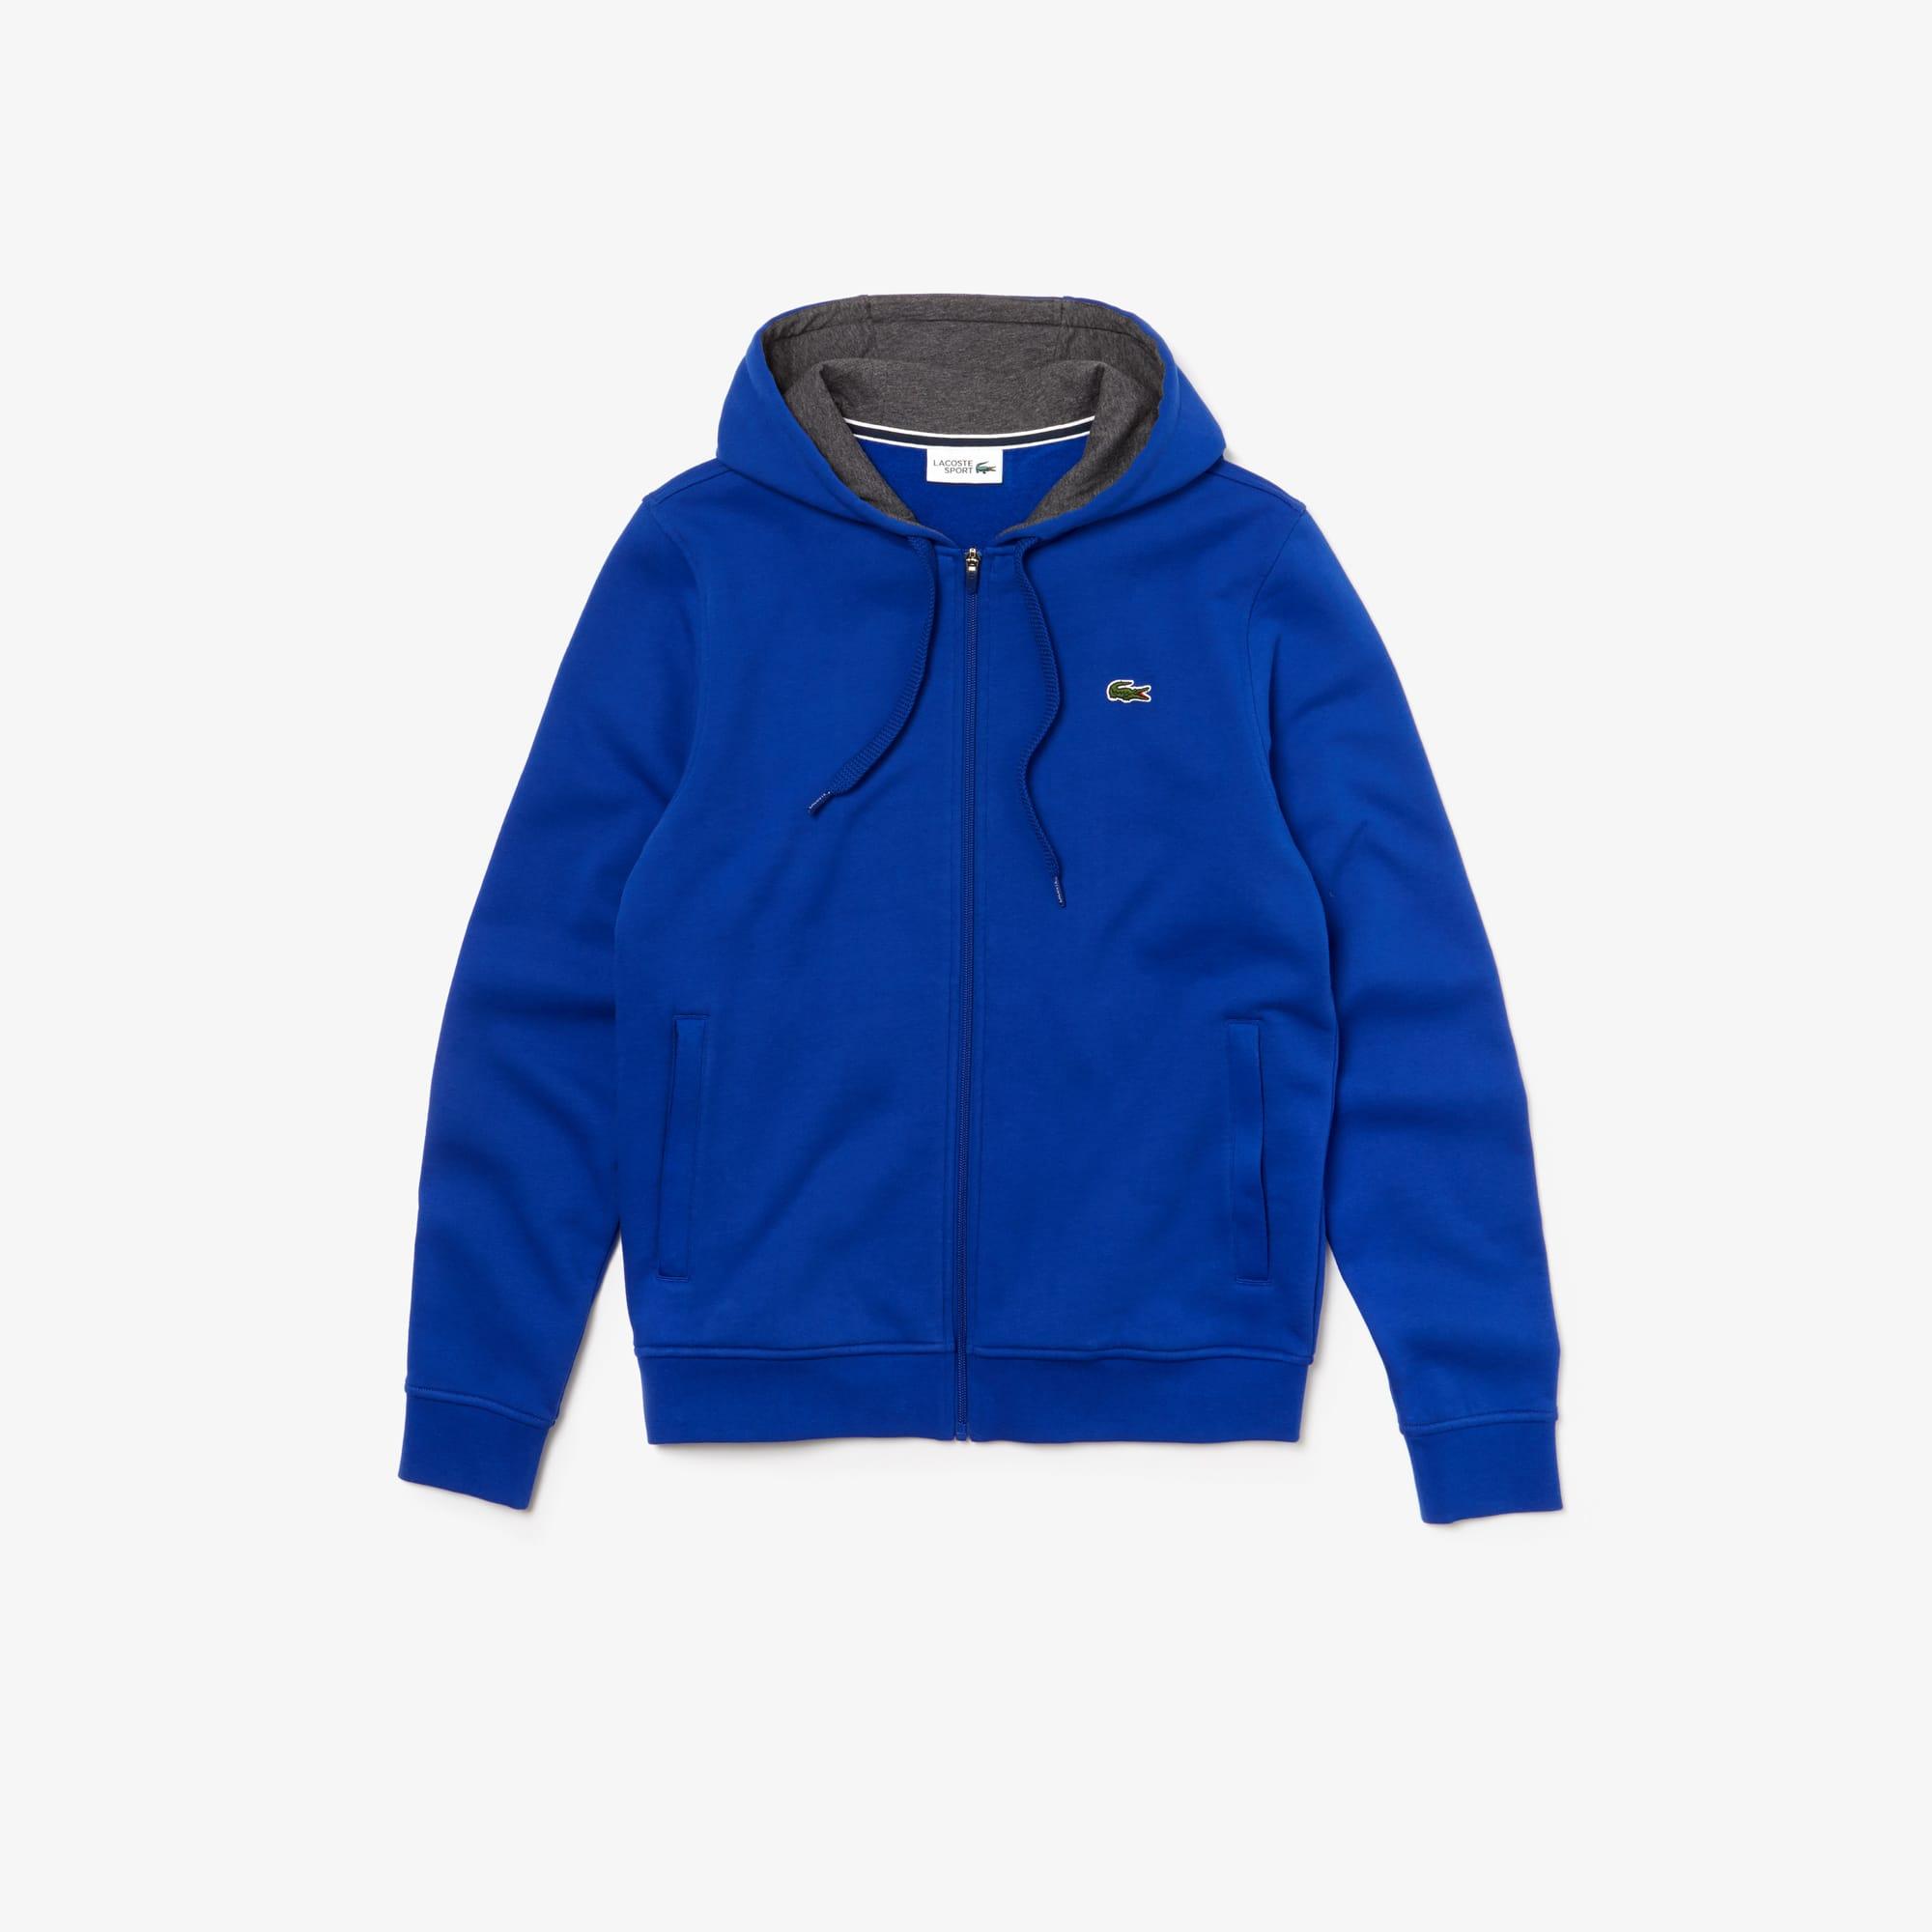 23c39818a5b Men s Lacoste SPORT Tennis hooded zippered sweatshirt in fleece. £90.00. +  7 colors